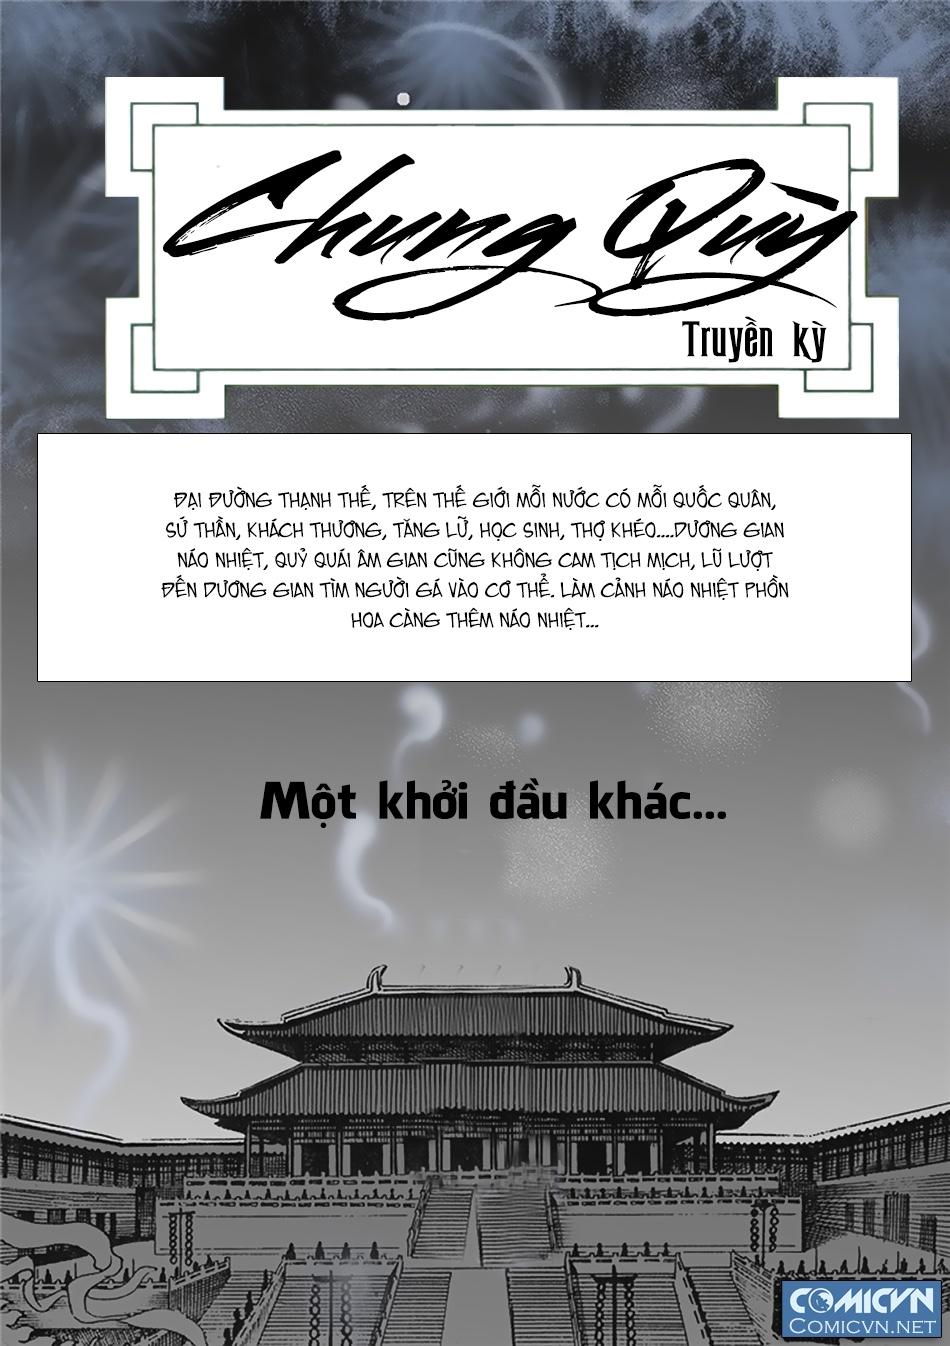 Chung Quỳ Truyền Kỳ Chapter 34 - Hamtruyen.vn